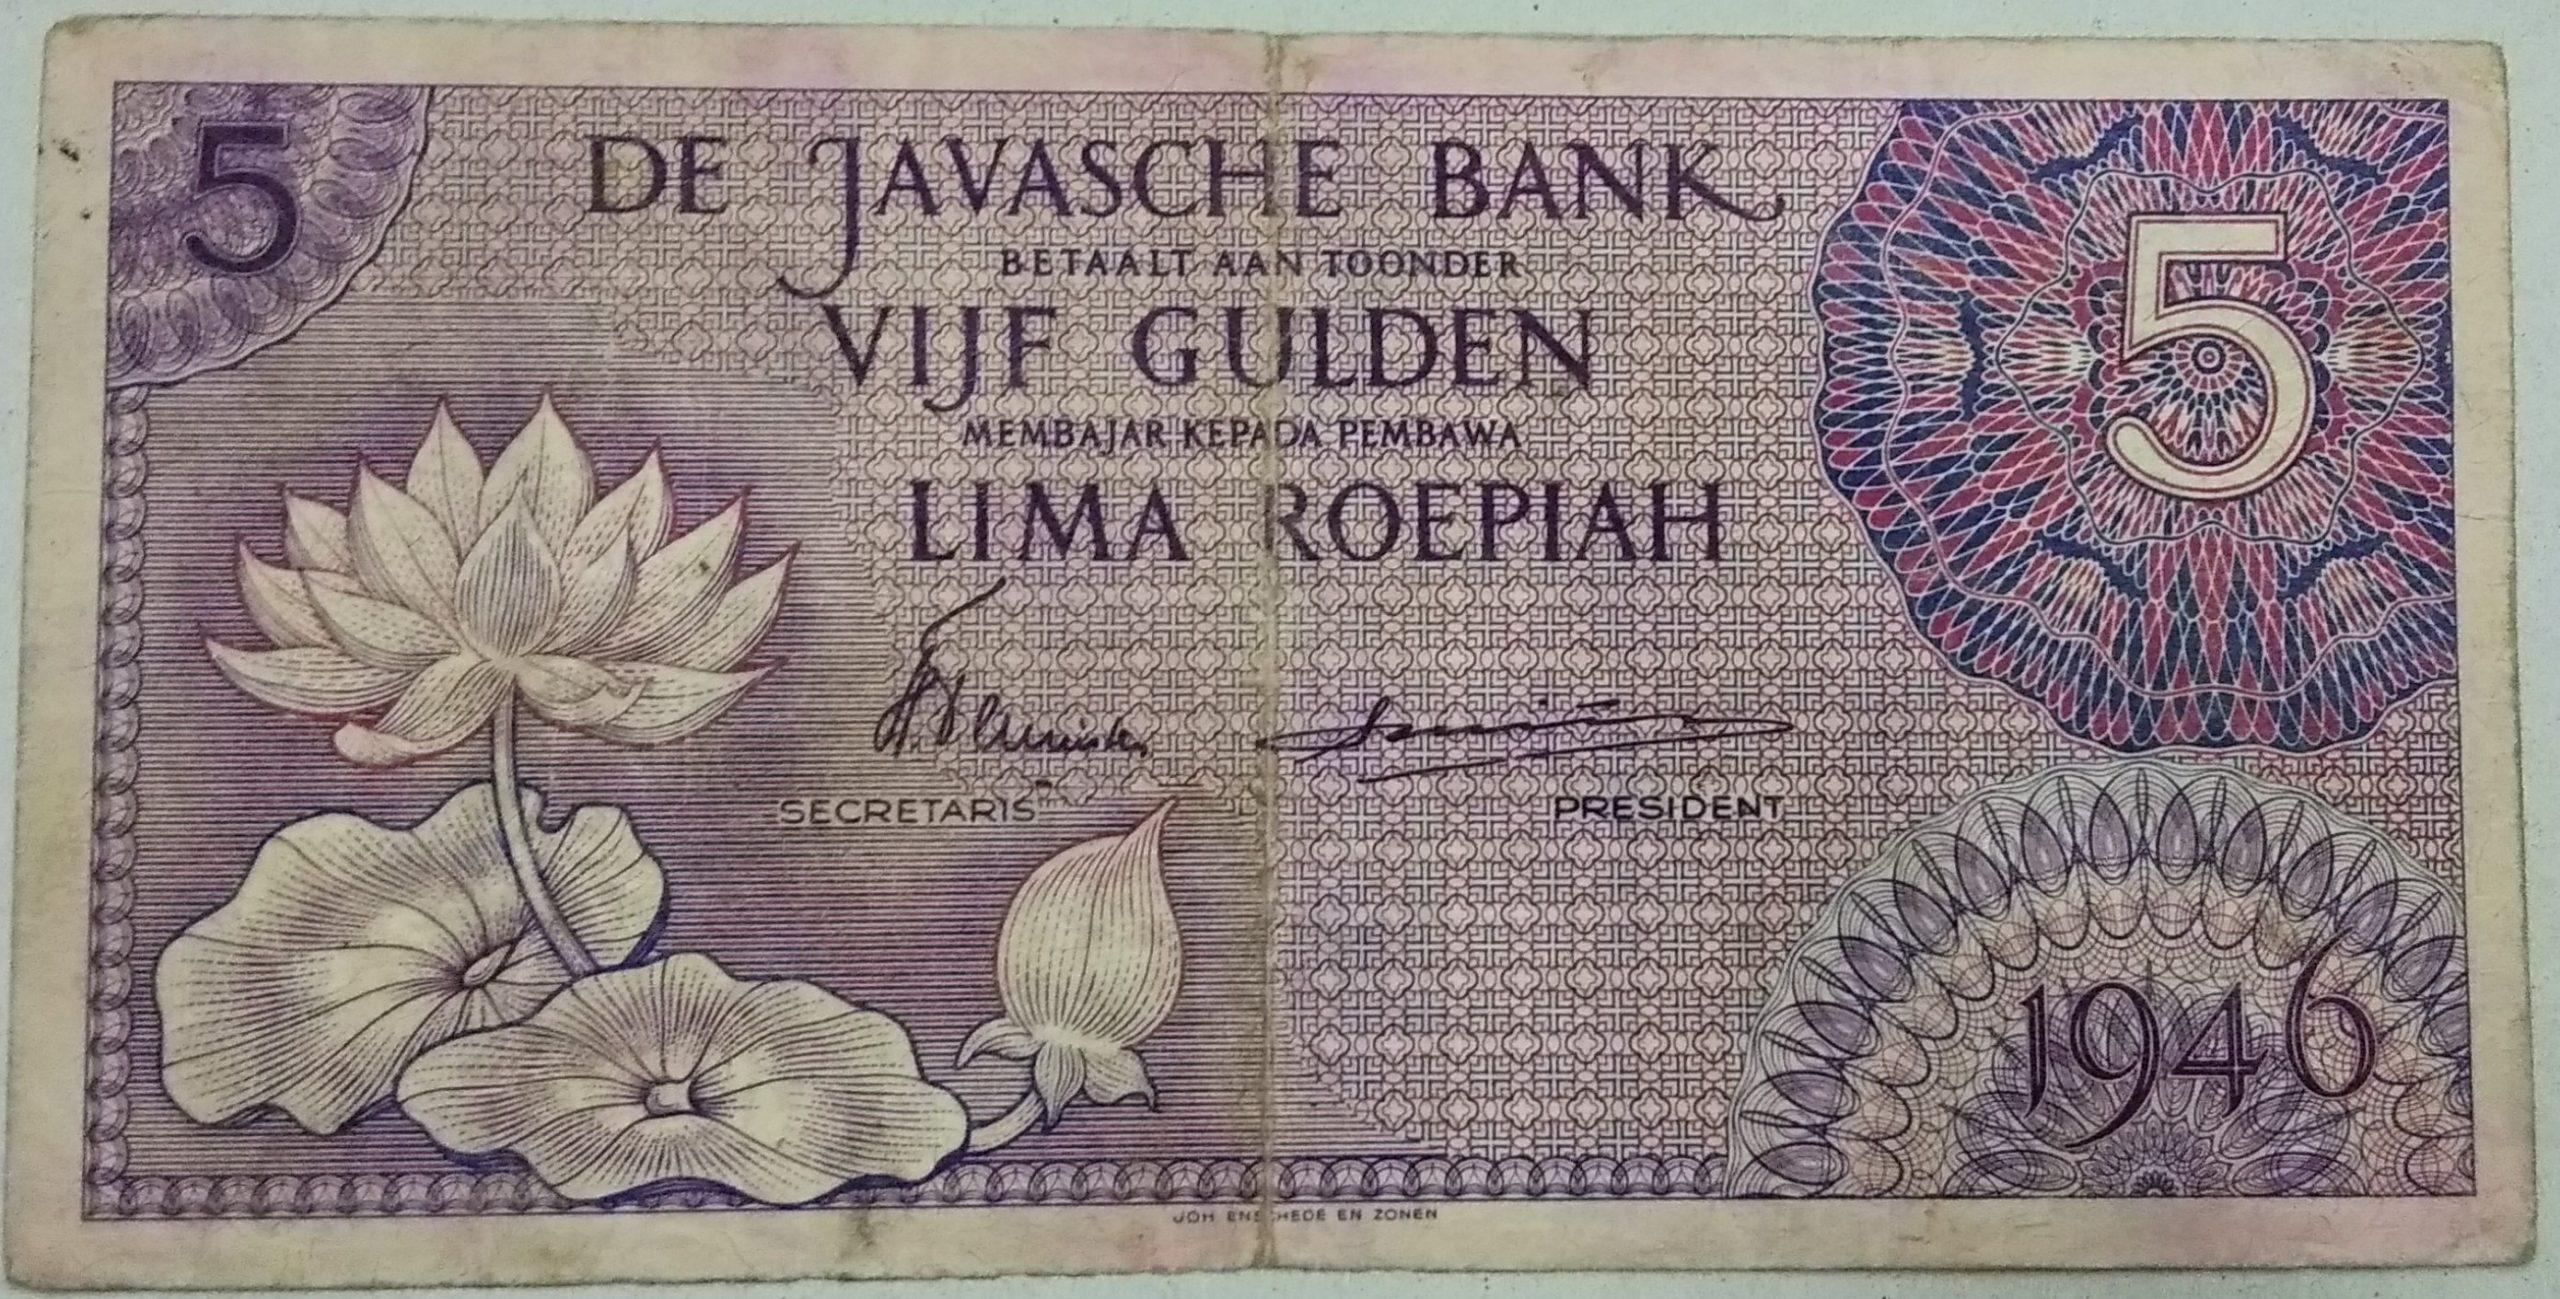 Netherlands Indie 5 roepiah 1946 banknote for sale